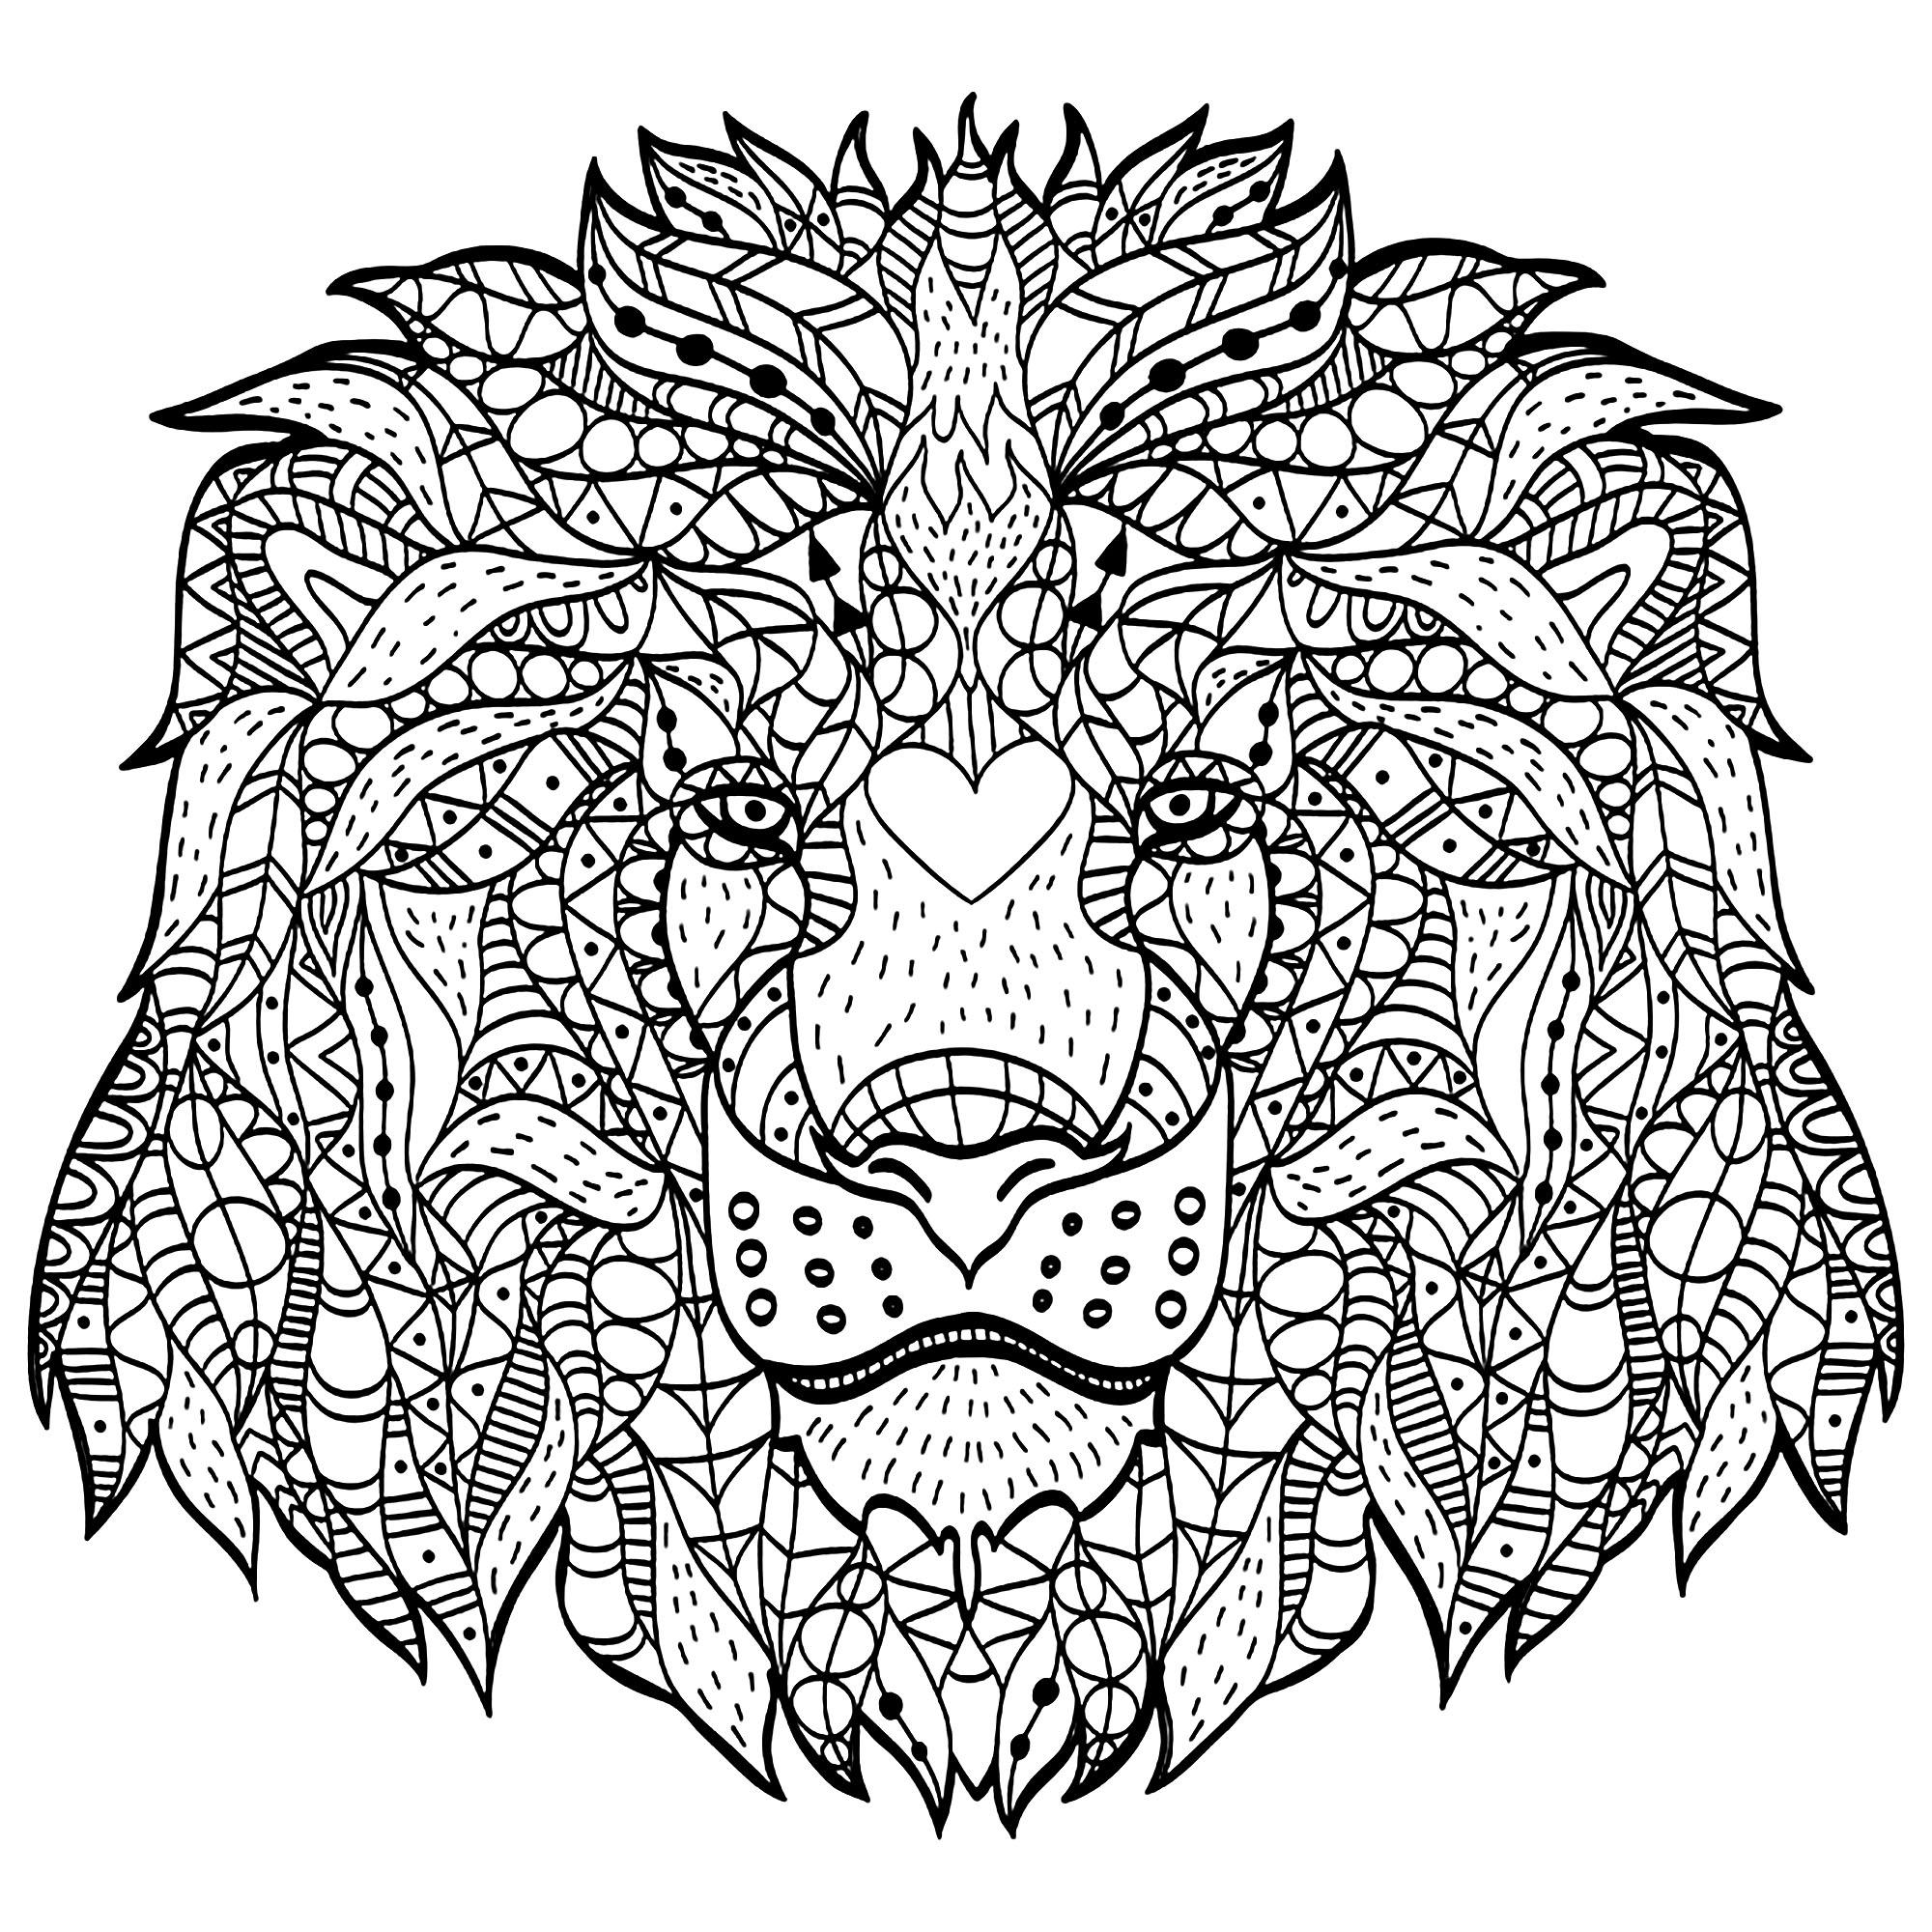 Majestic Lion Lions Adult Coloring Pages